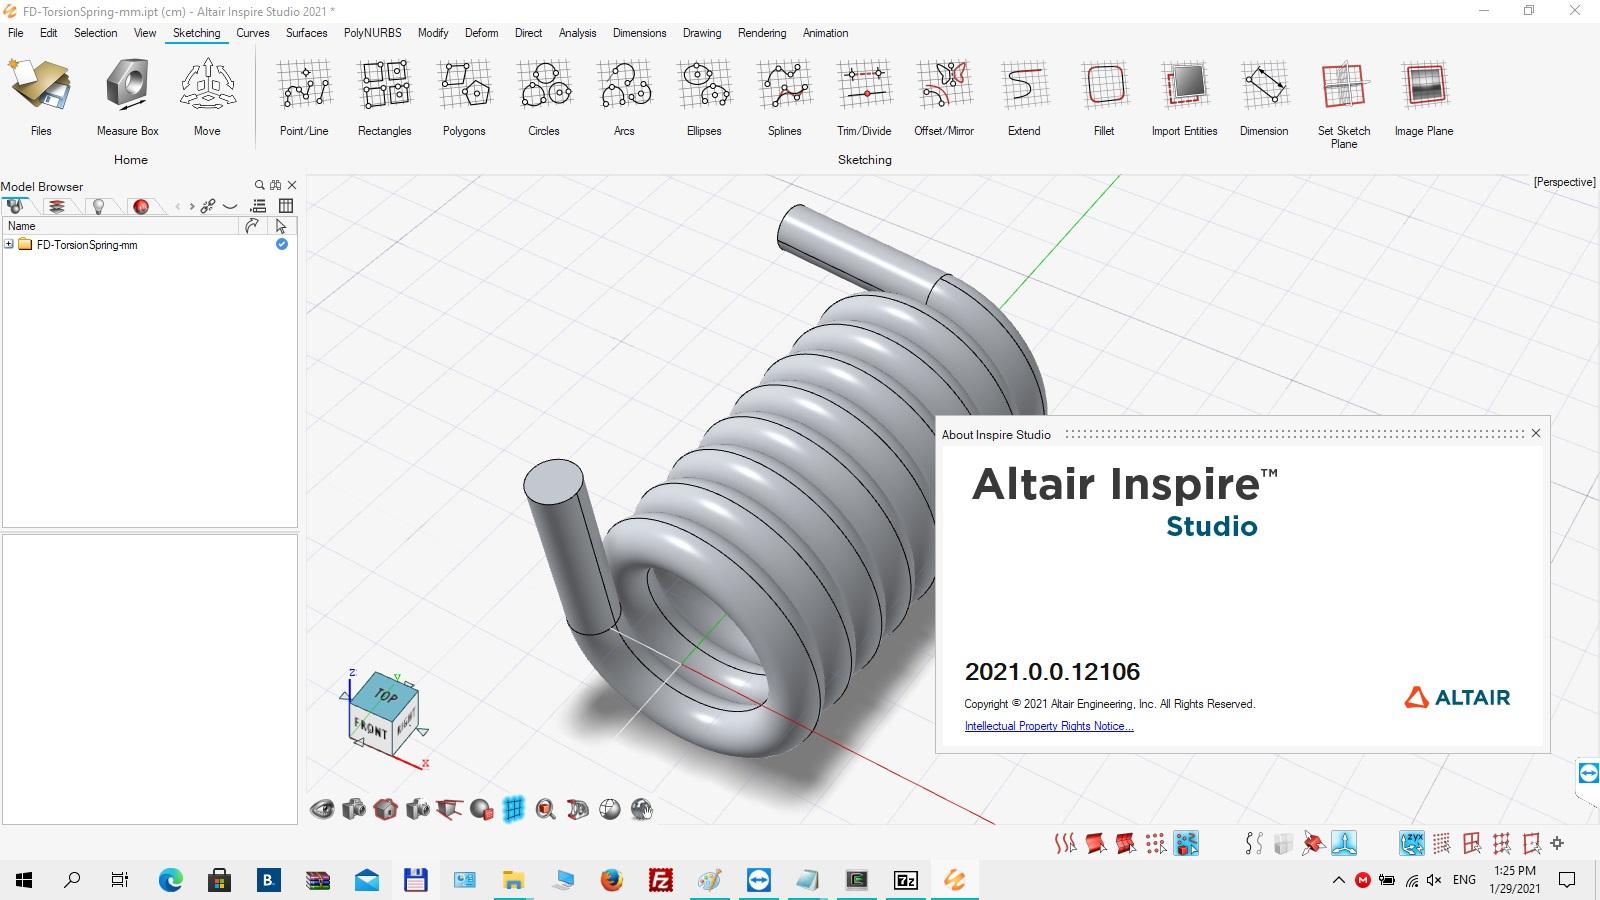 Download Altair Inspire Studio 2021.0 Build 12106 Win64 full license